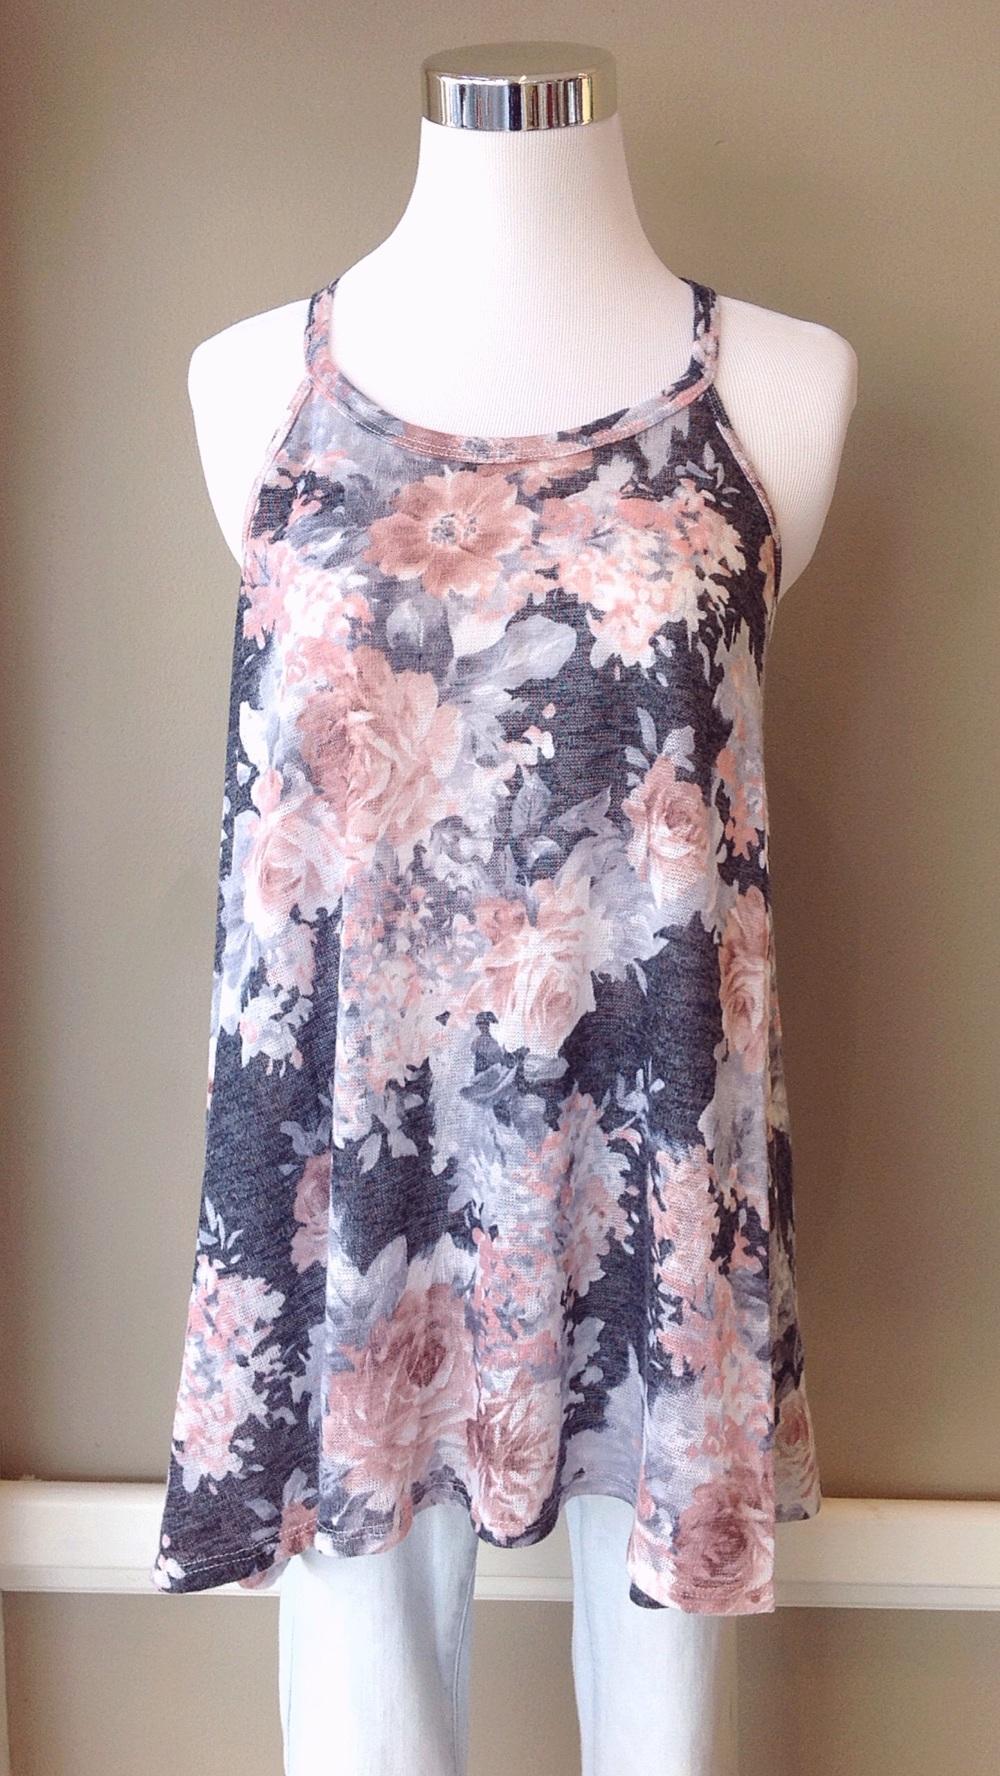 Knit floral swing tank, $28